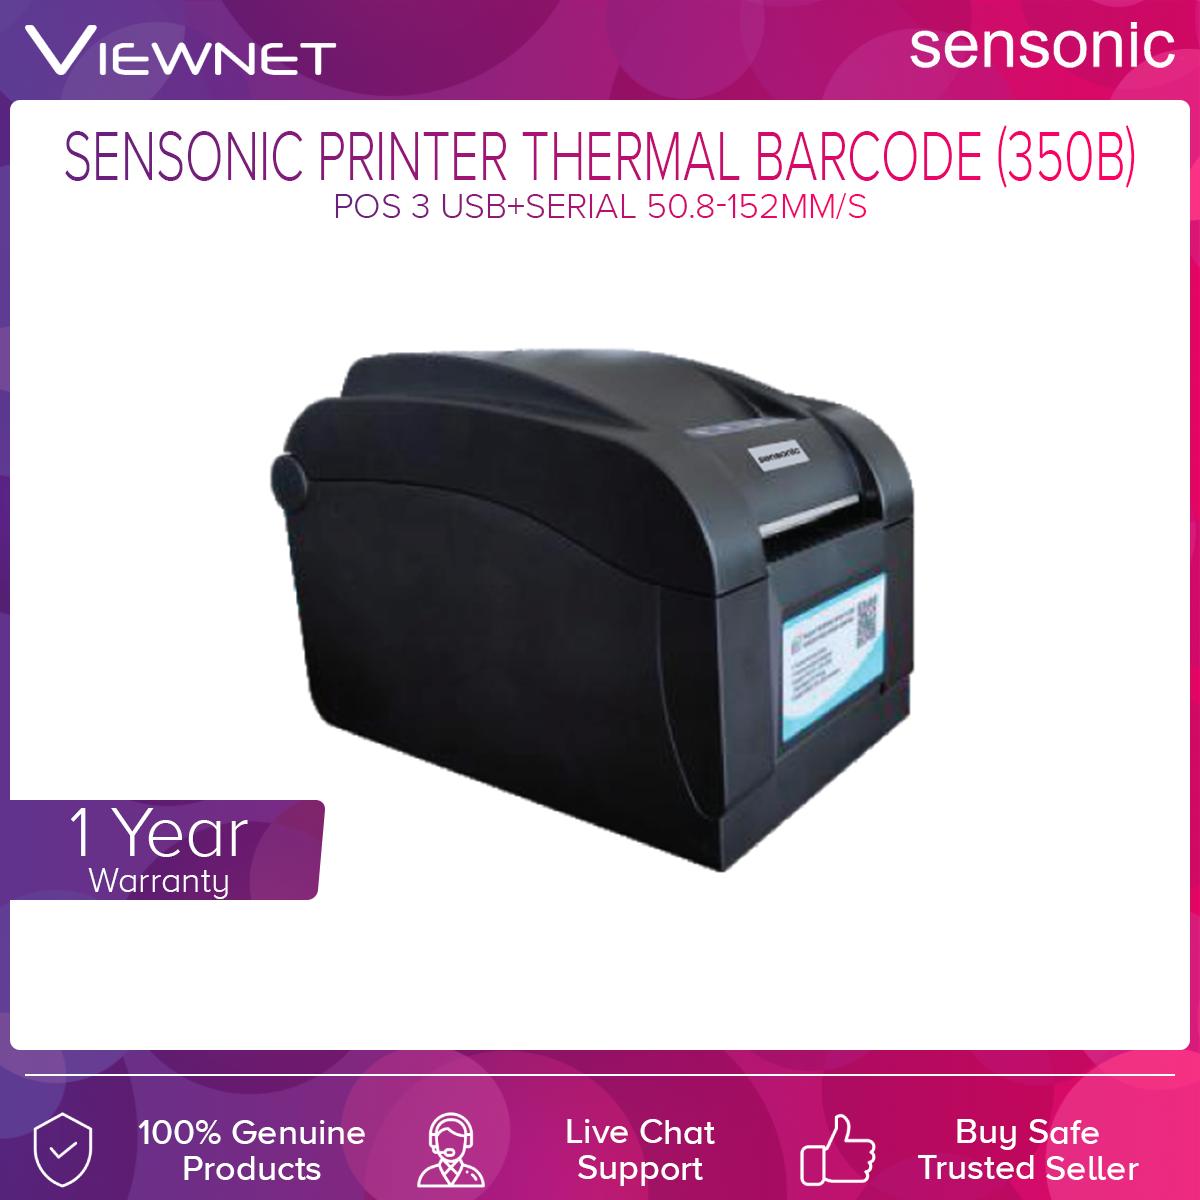 Sensonic 350B Printer Thermal Barcode Pos 3 USB+SERIAL 50.8-152MM/S